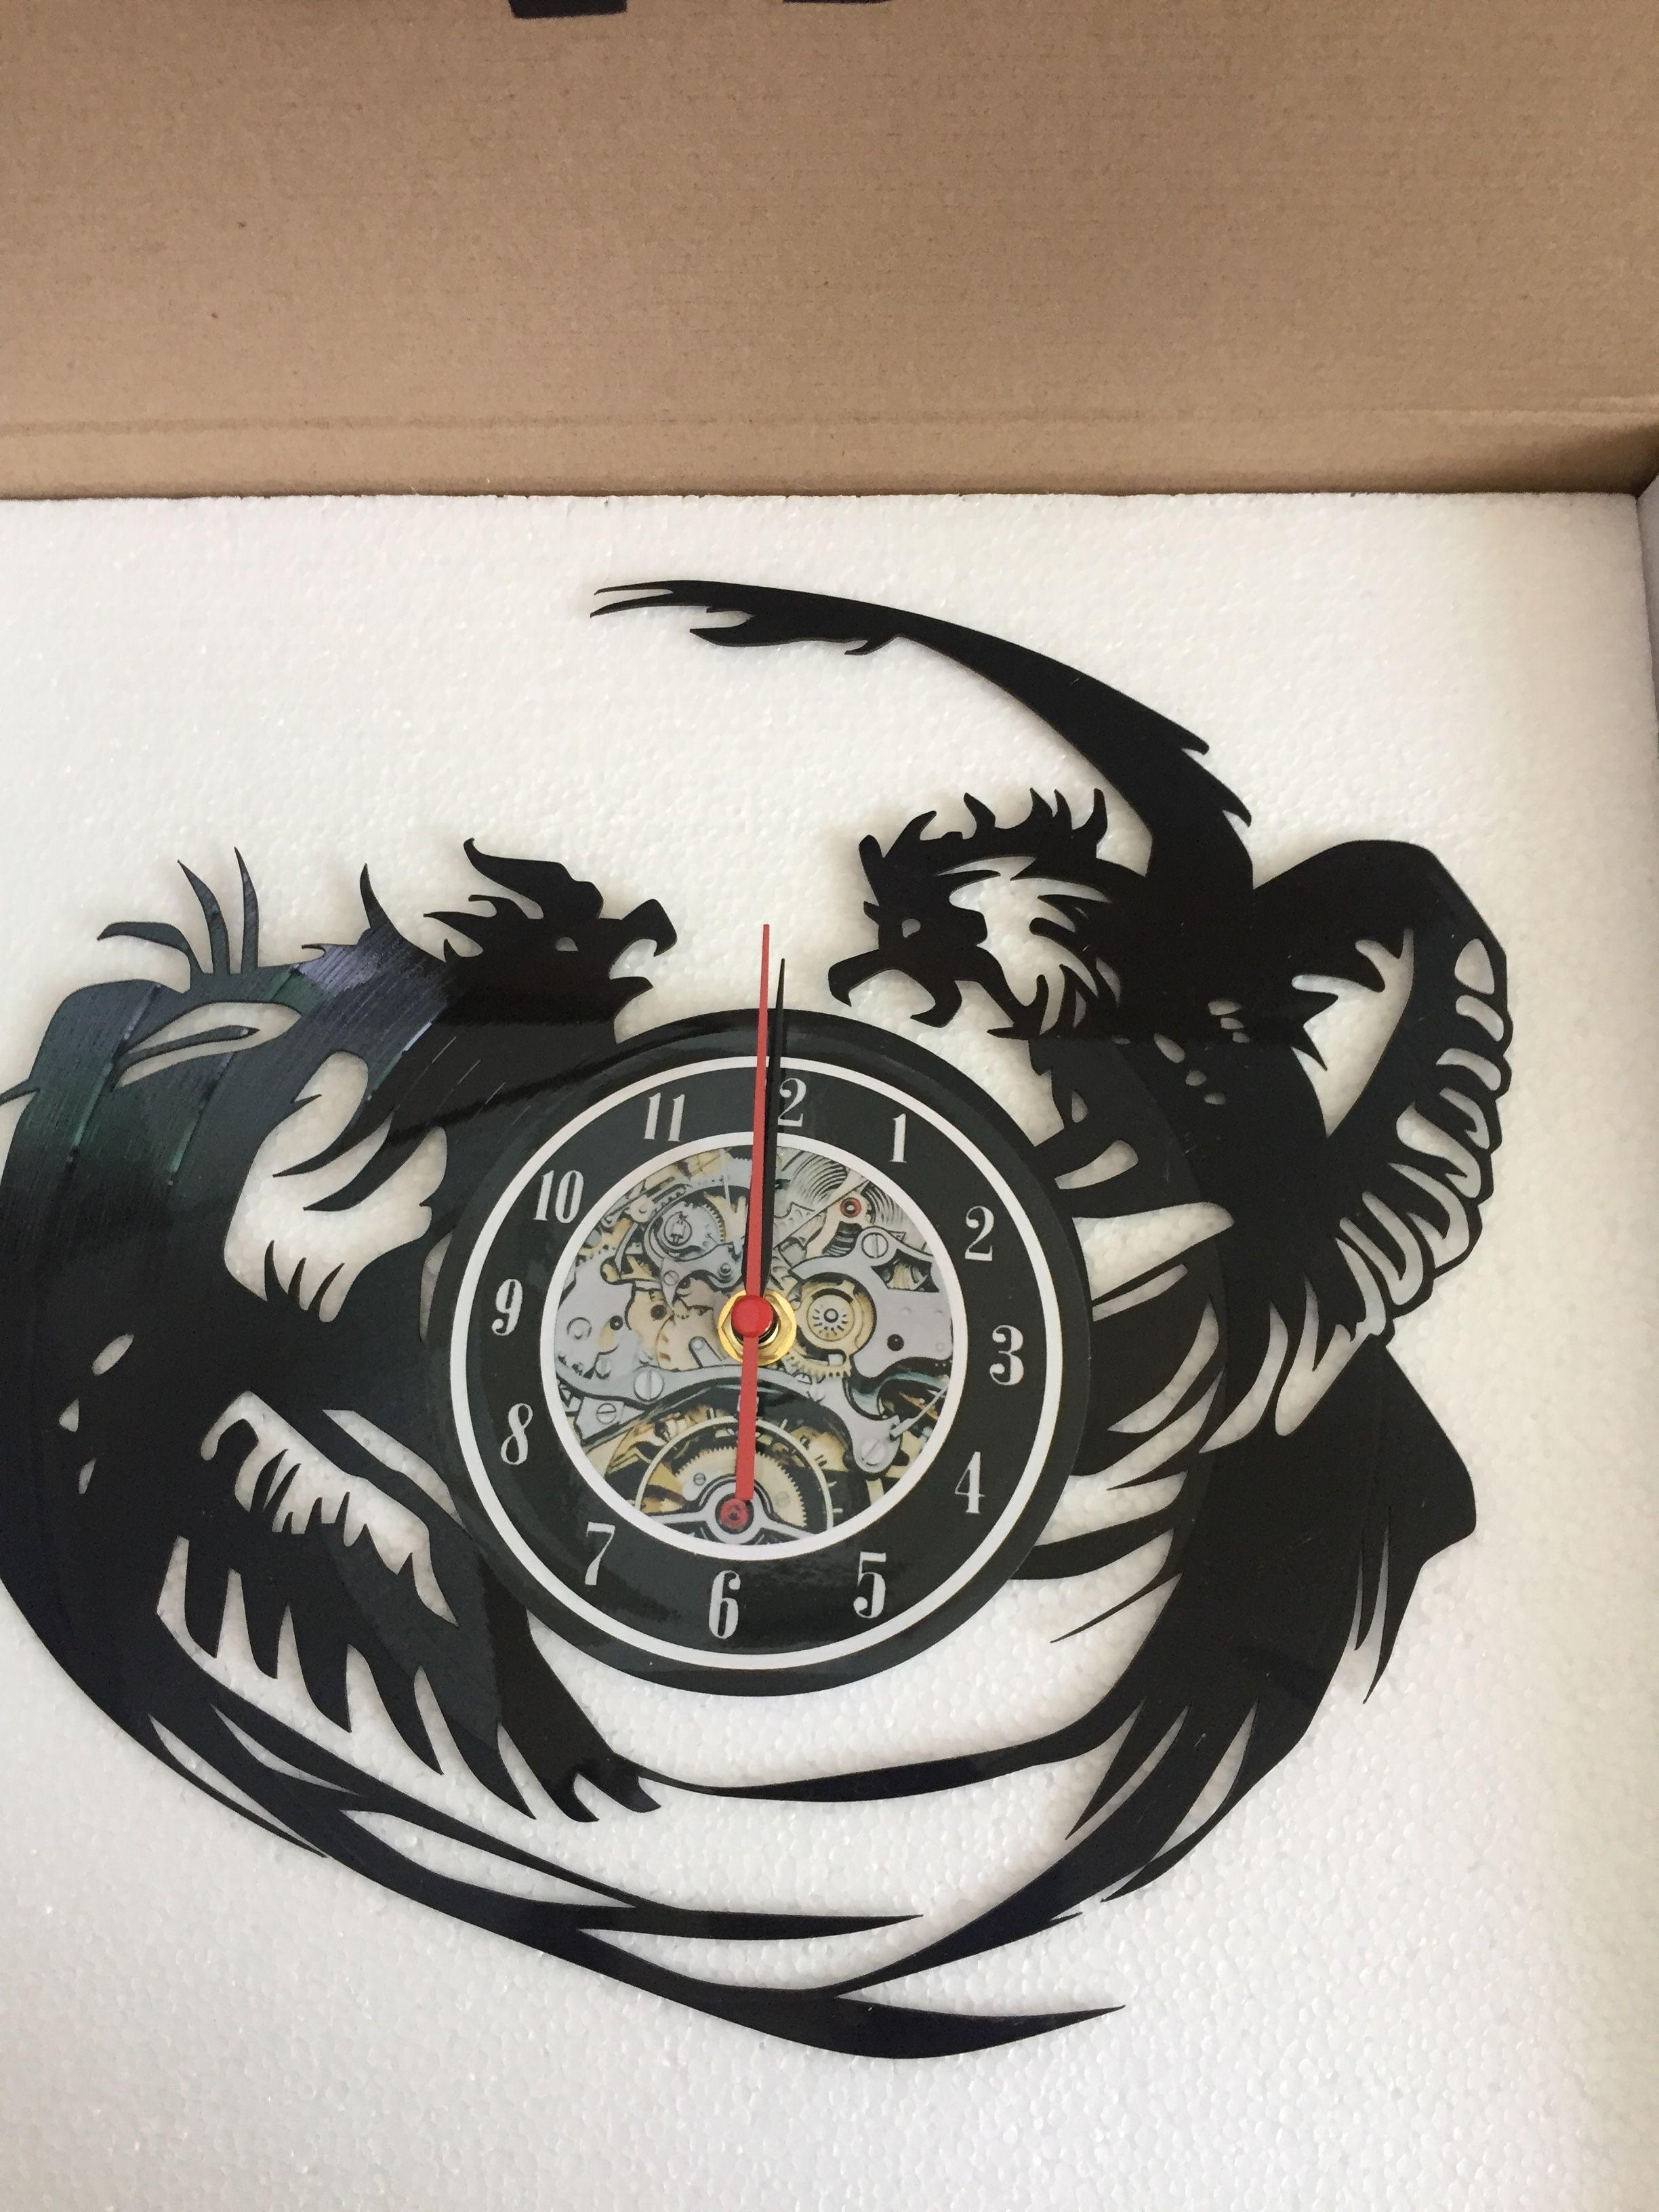 Großhandel Zwei Adler Vinyl Wanduhr Geschenke Balck, 2018 New Style ...